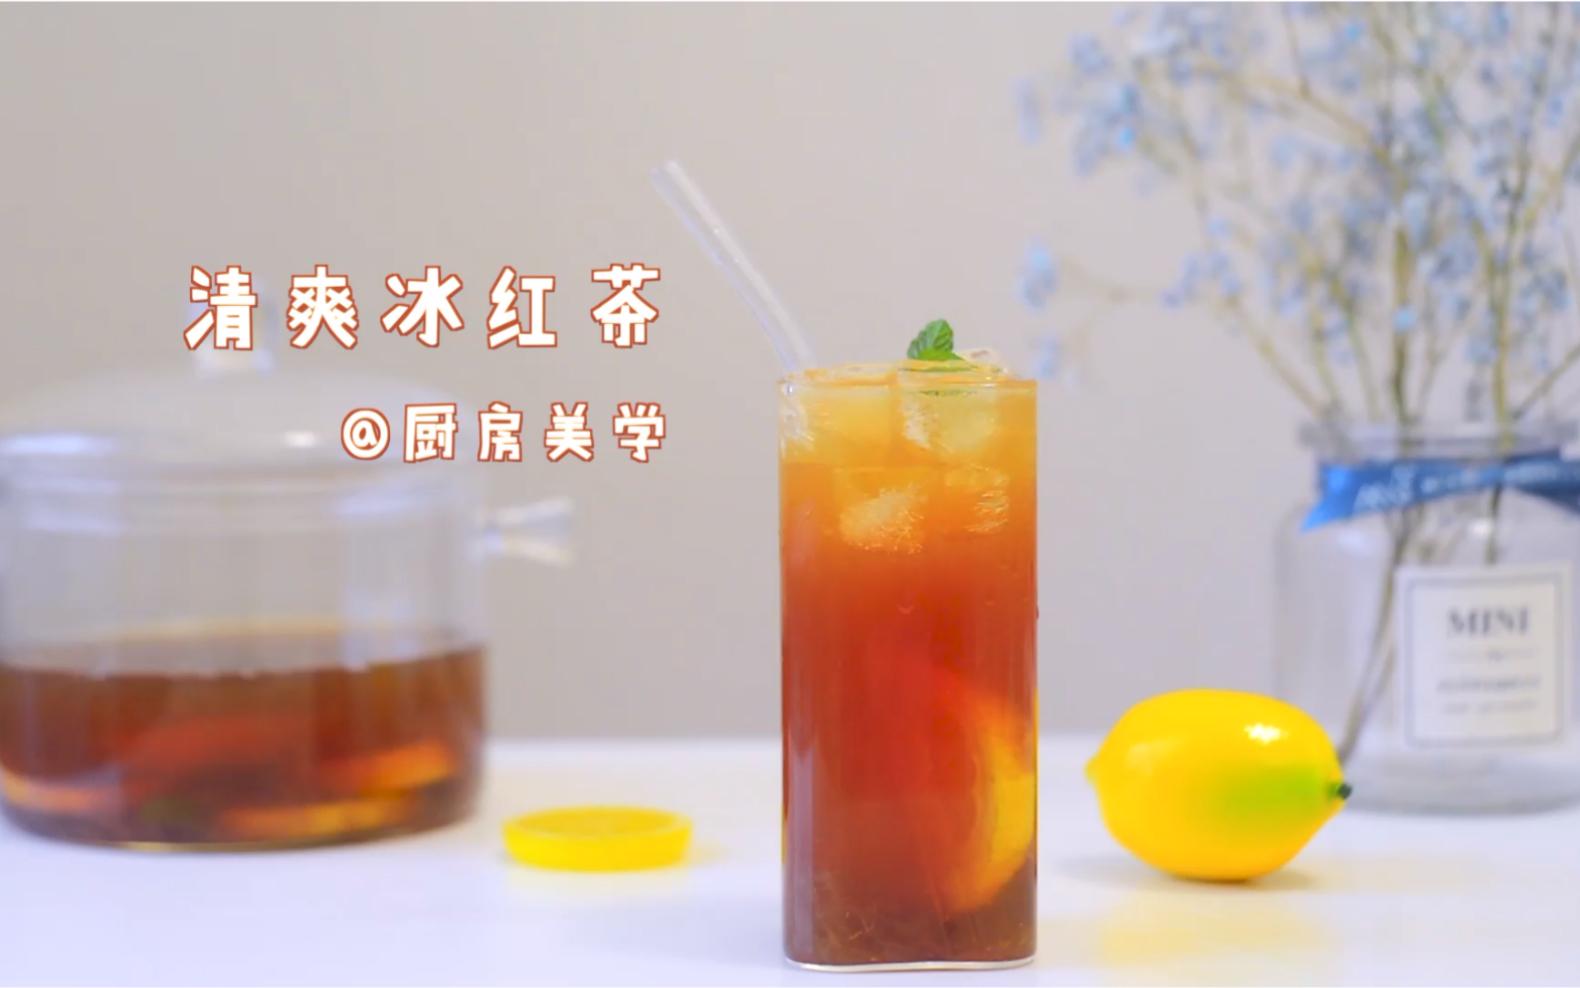 立顿红茶好_在家自制清爽冰红茶,比买的好喝n倍_哔哩哔哩 (゜-゜)つロ 干杯 ...